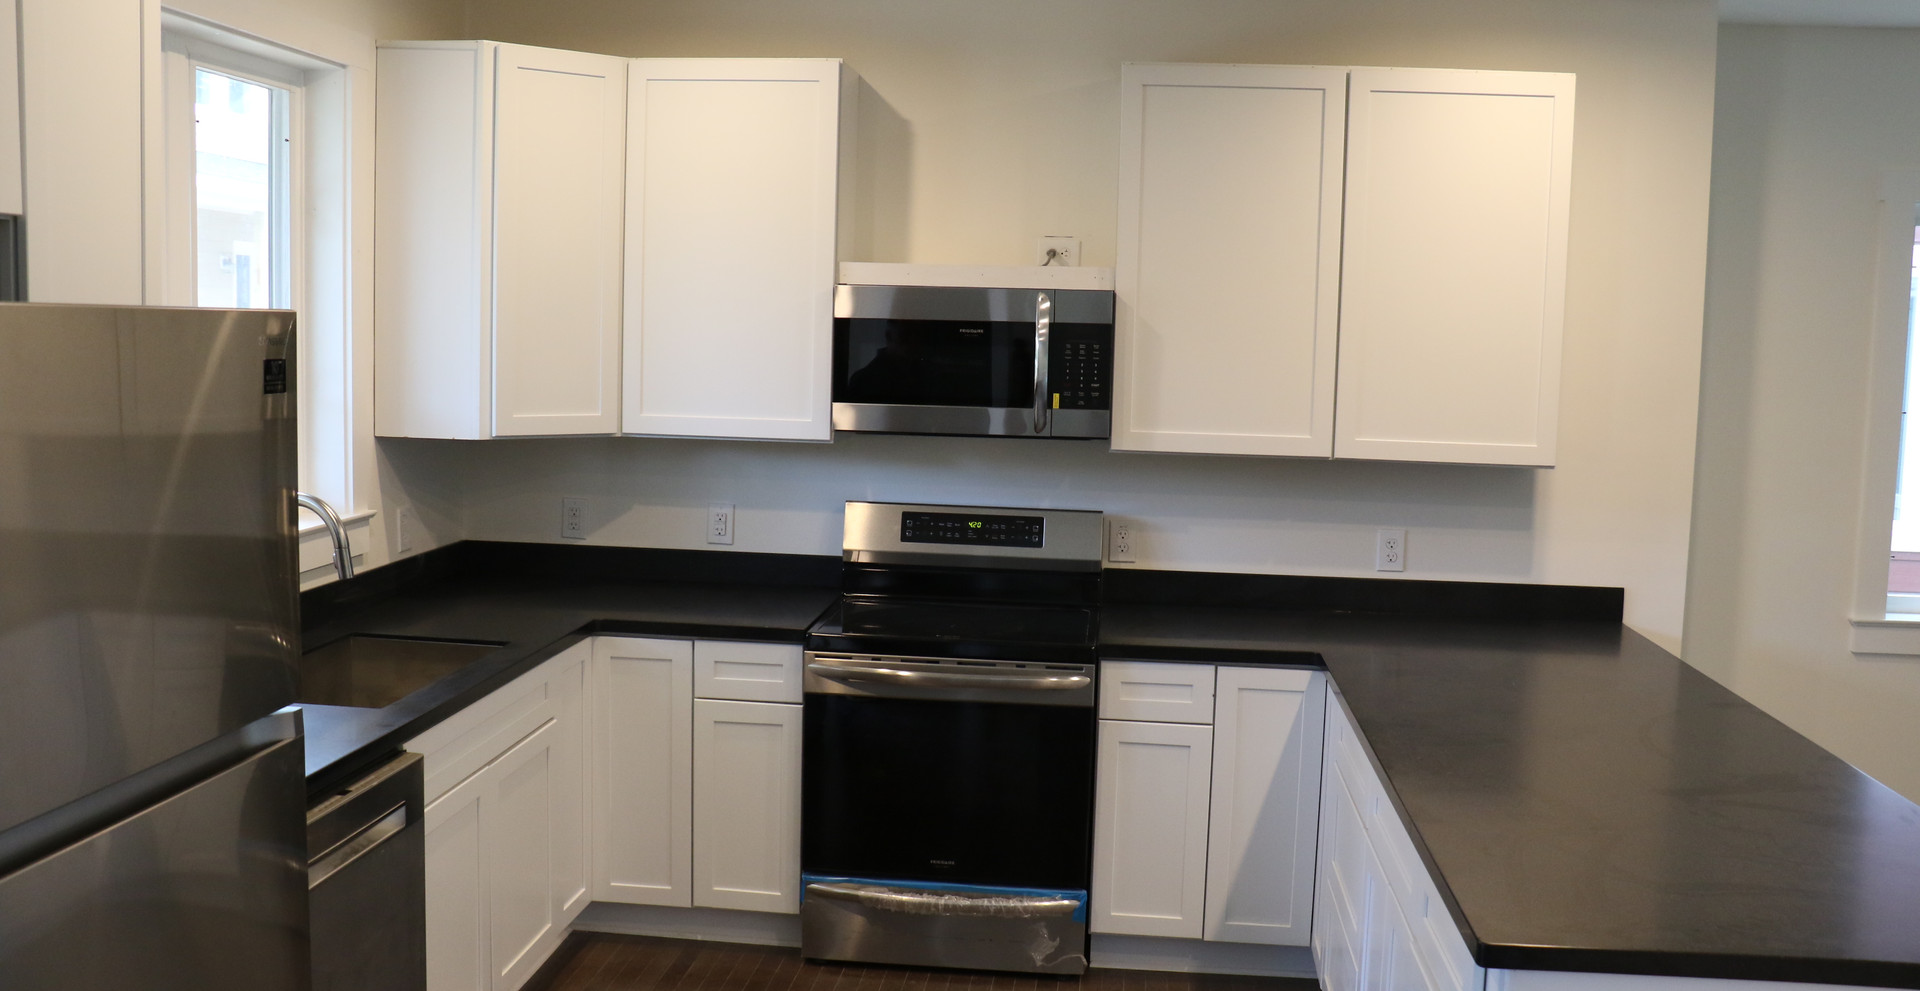 homebuilding_BK1A0055.JPG